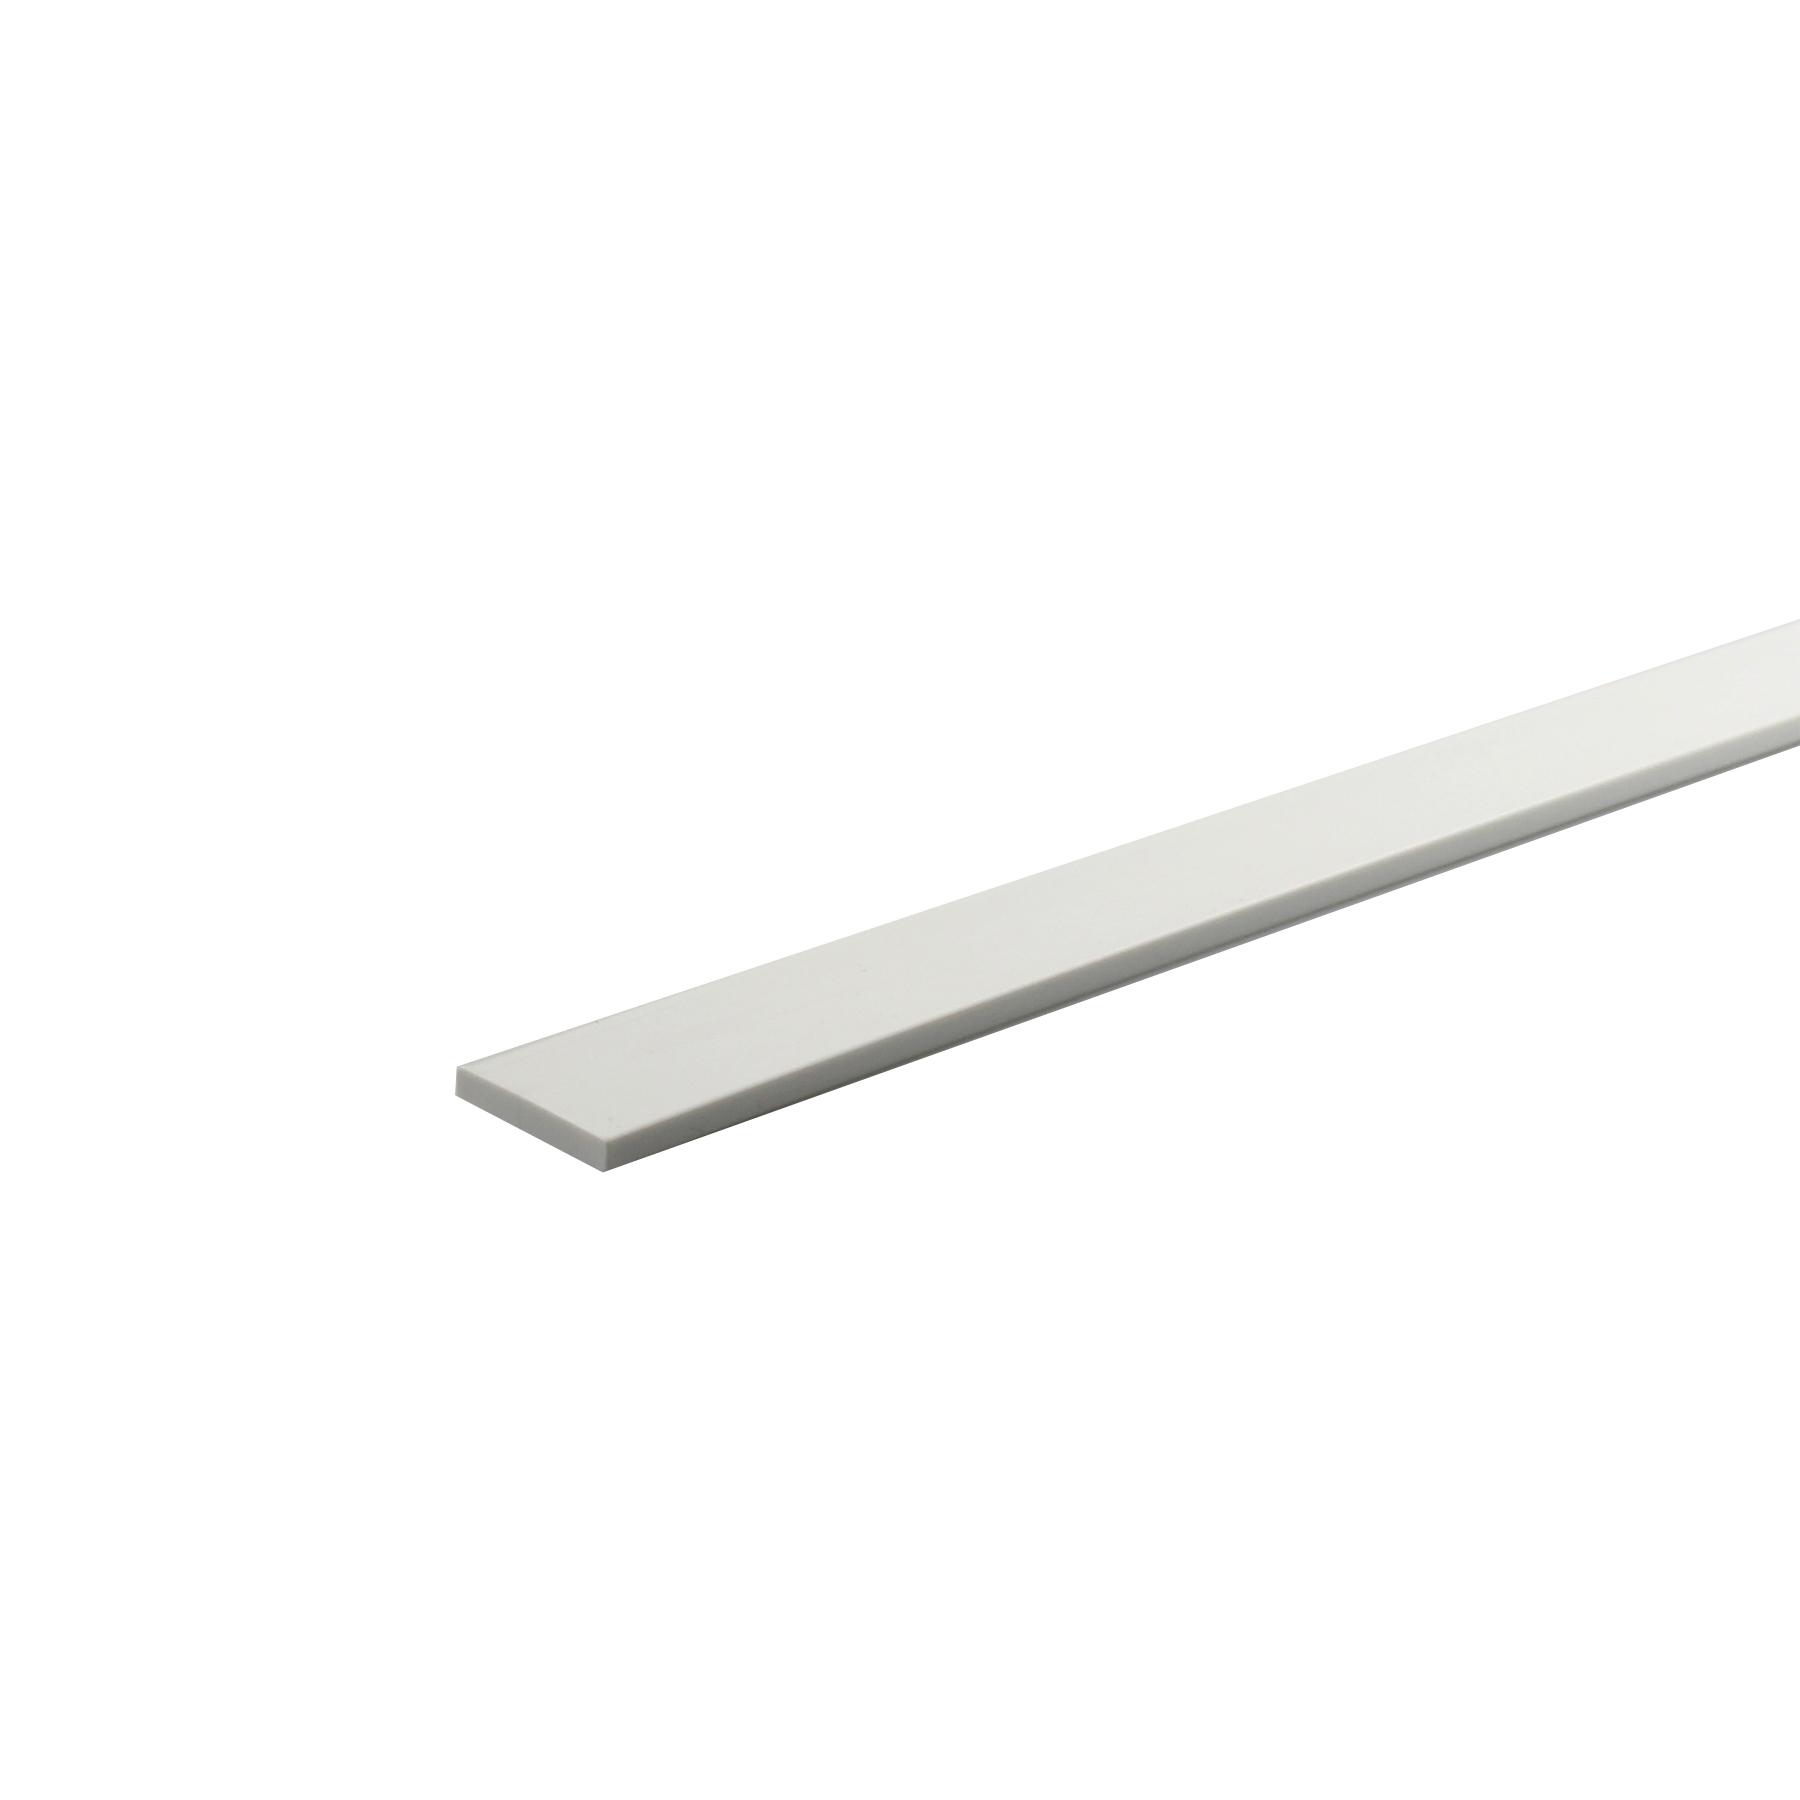 Perfil U PVC Porcelana 1mx1cm